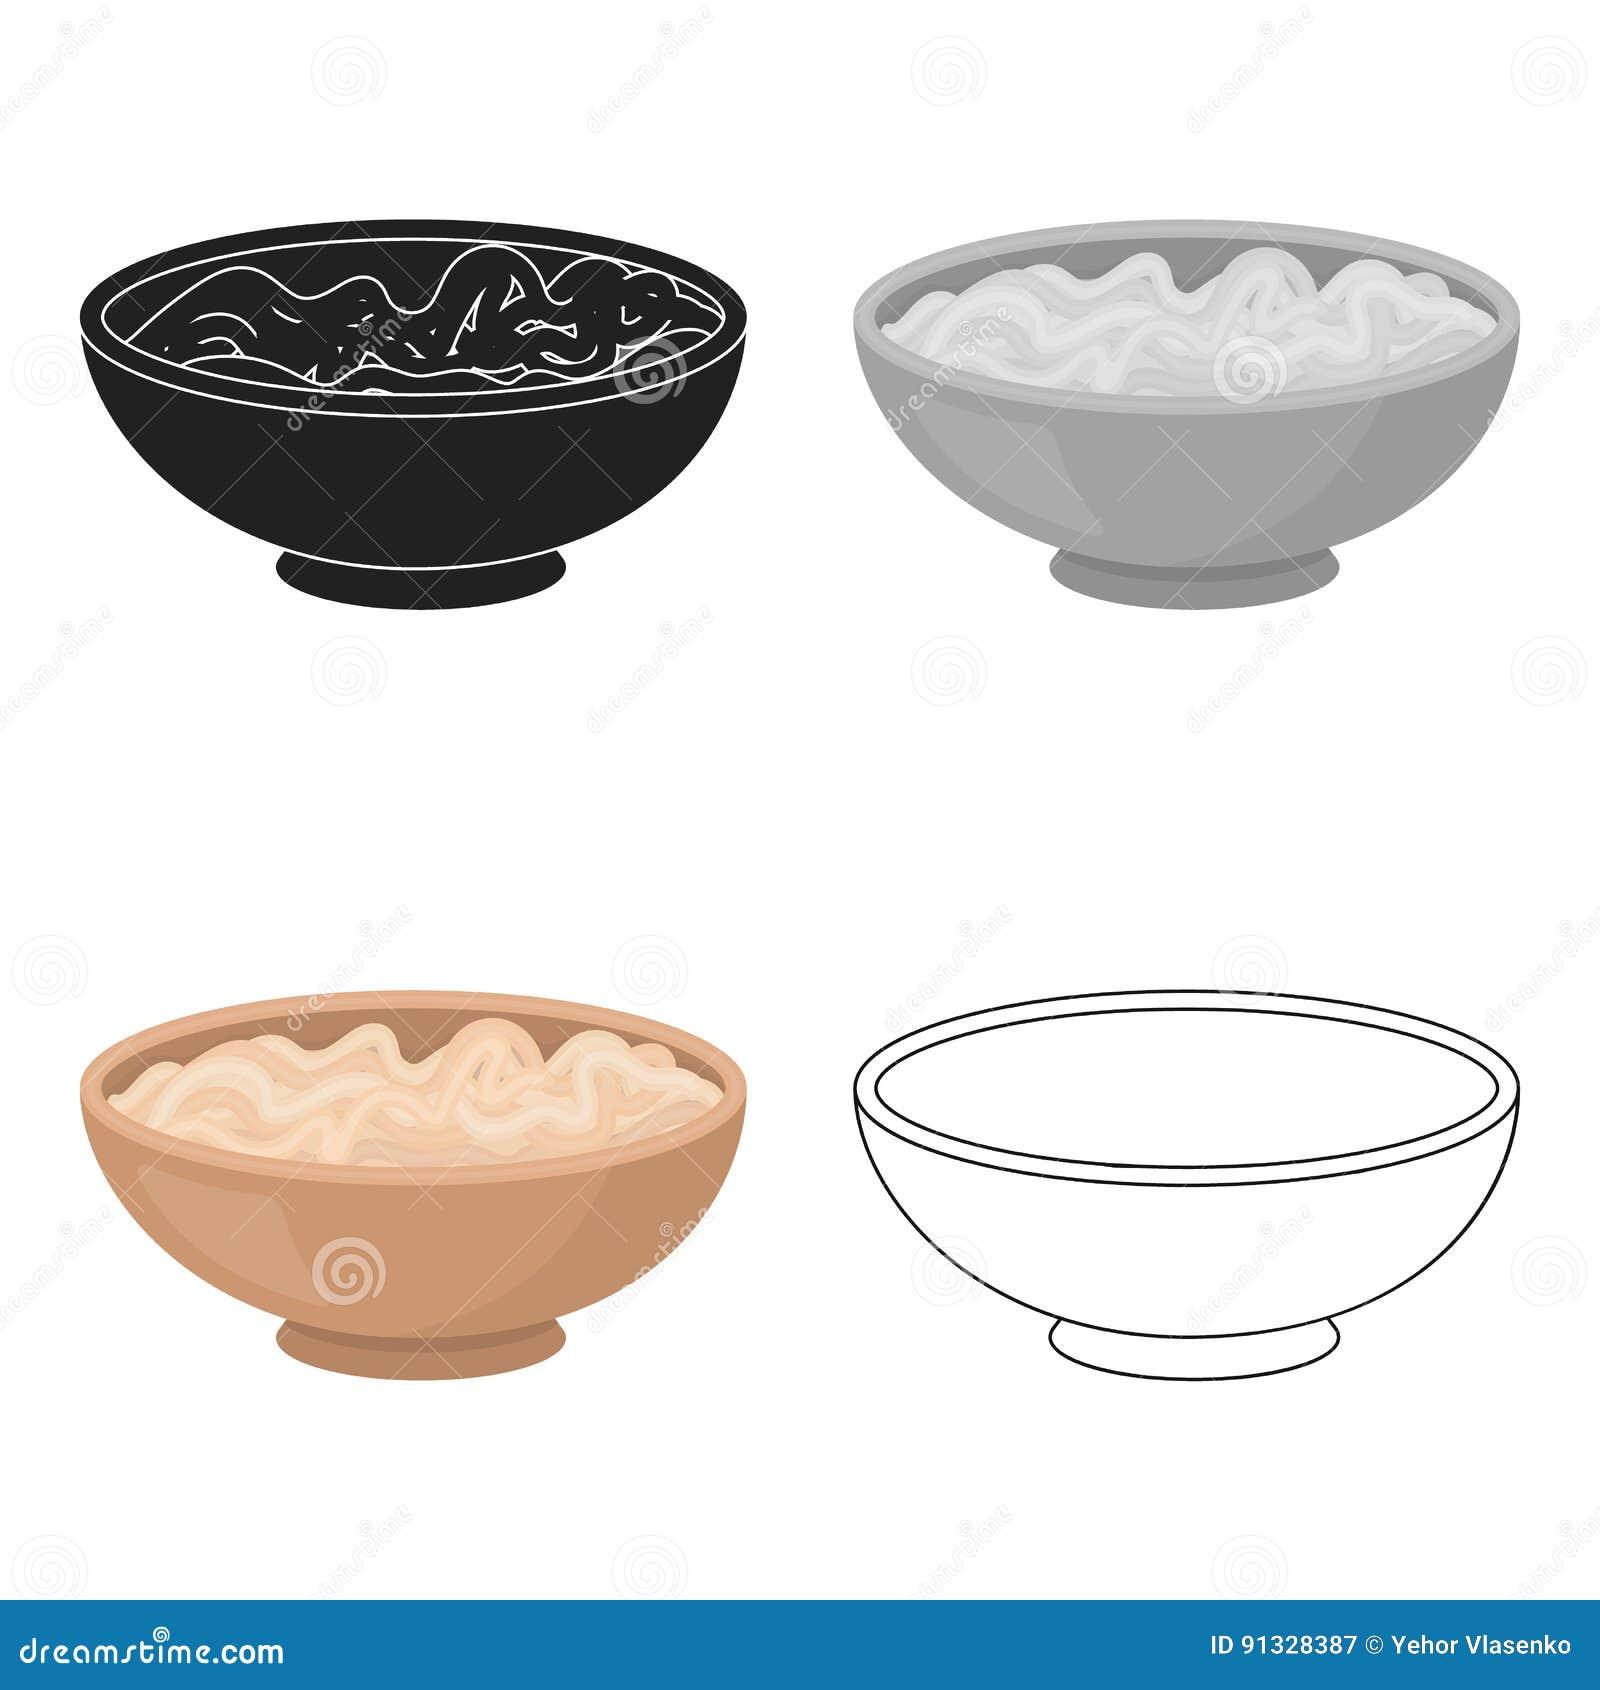 Udon icon in cartoon style isolated on white background. Sushi symbol stock vector illustration.